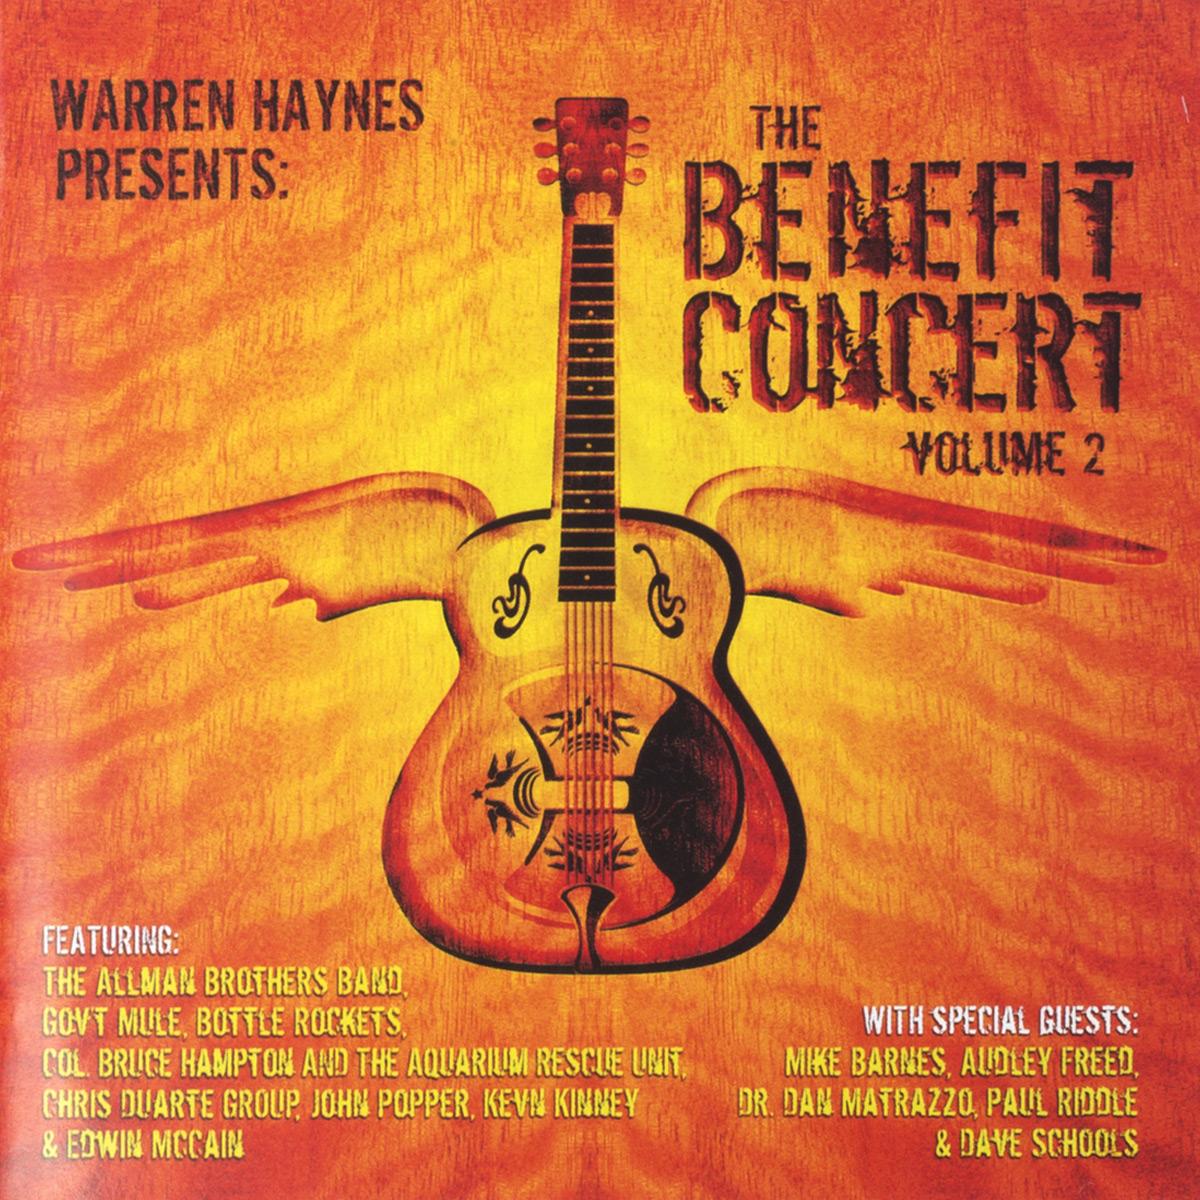 The Benefit Concert Vol. 2 Digital Download